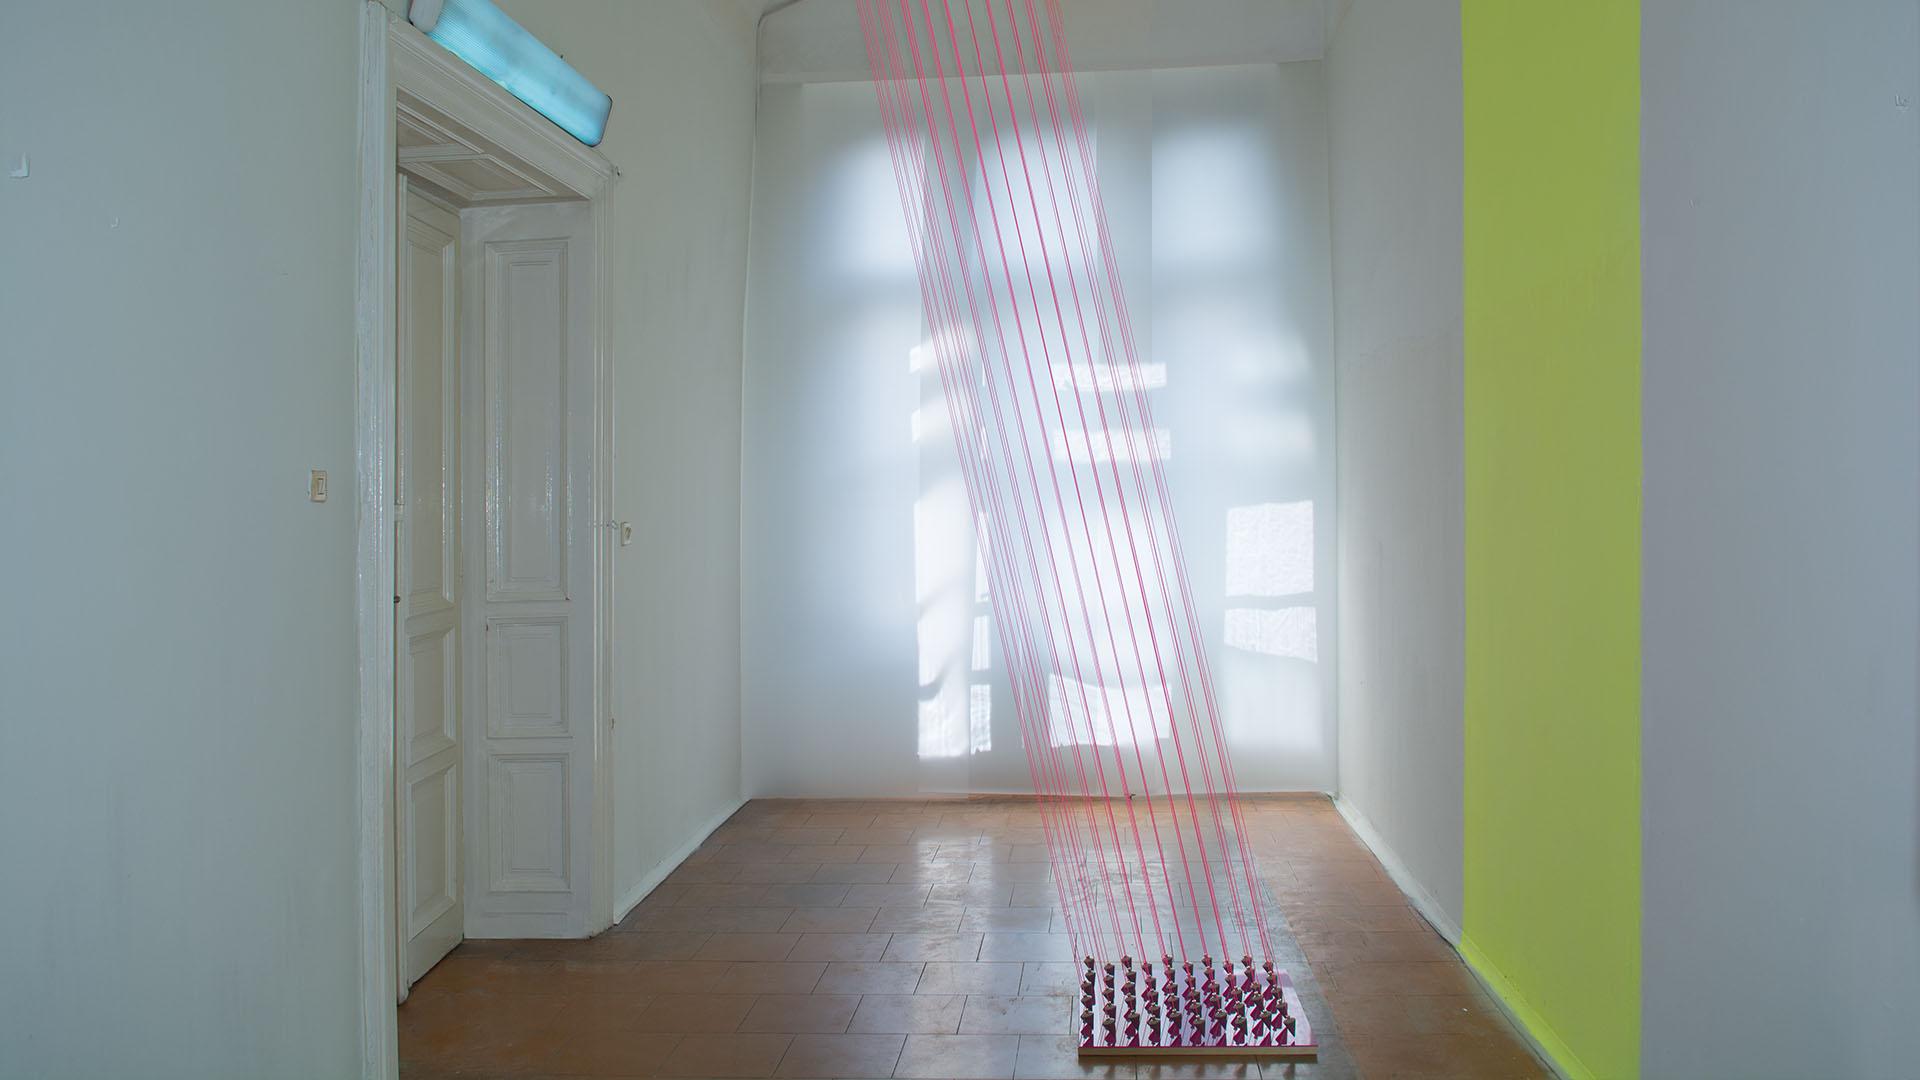 Perpendicular, Ausstellung Biennale Krakau, 2016